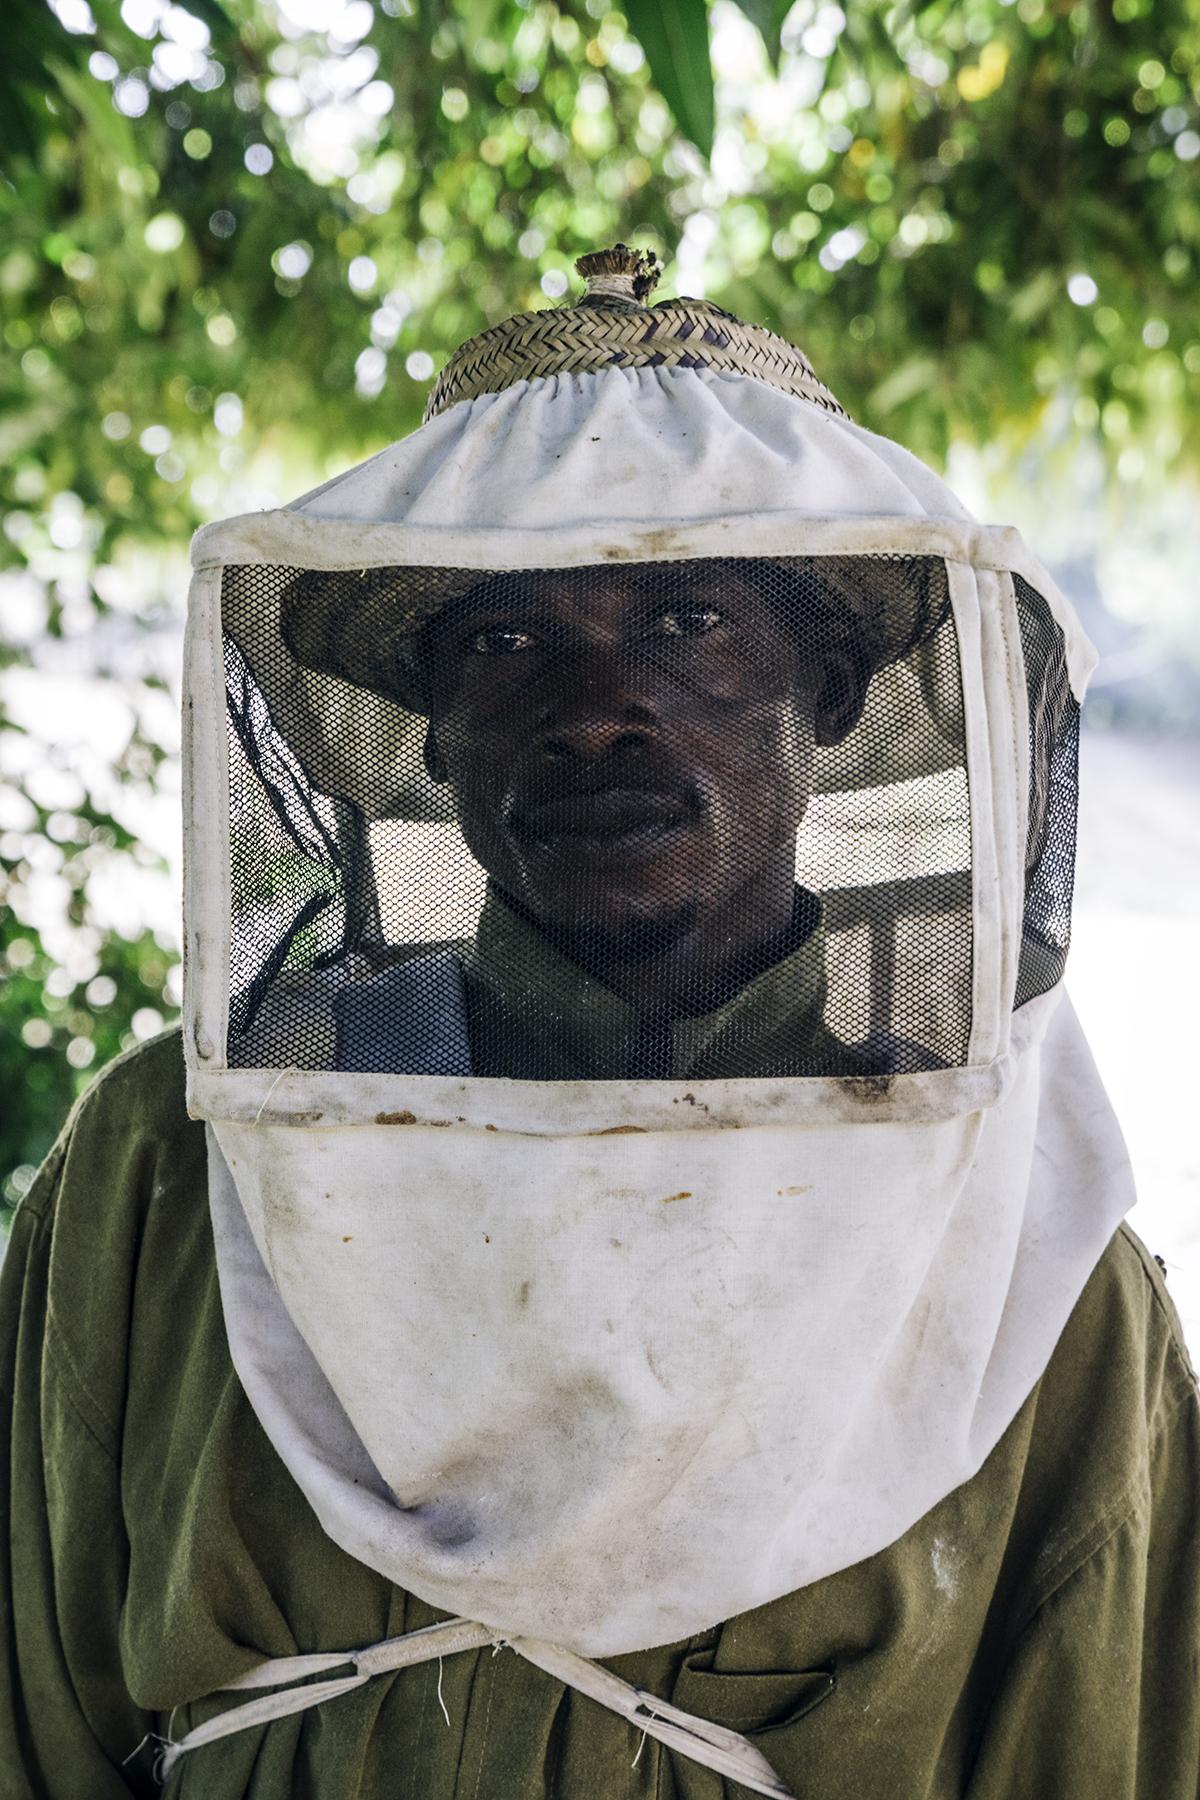 Uit de serie 'Jungle Bees' © Jurre Rompa